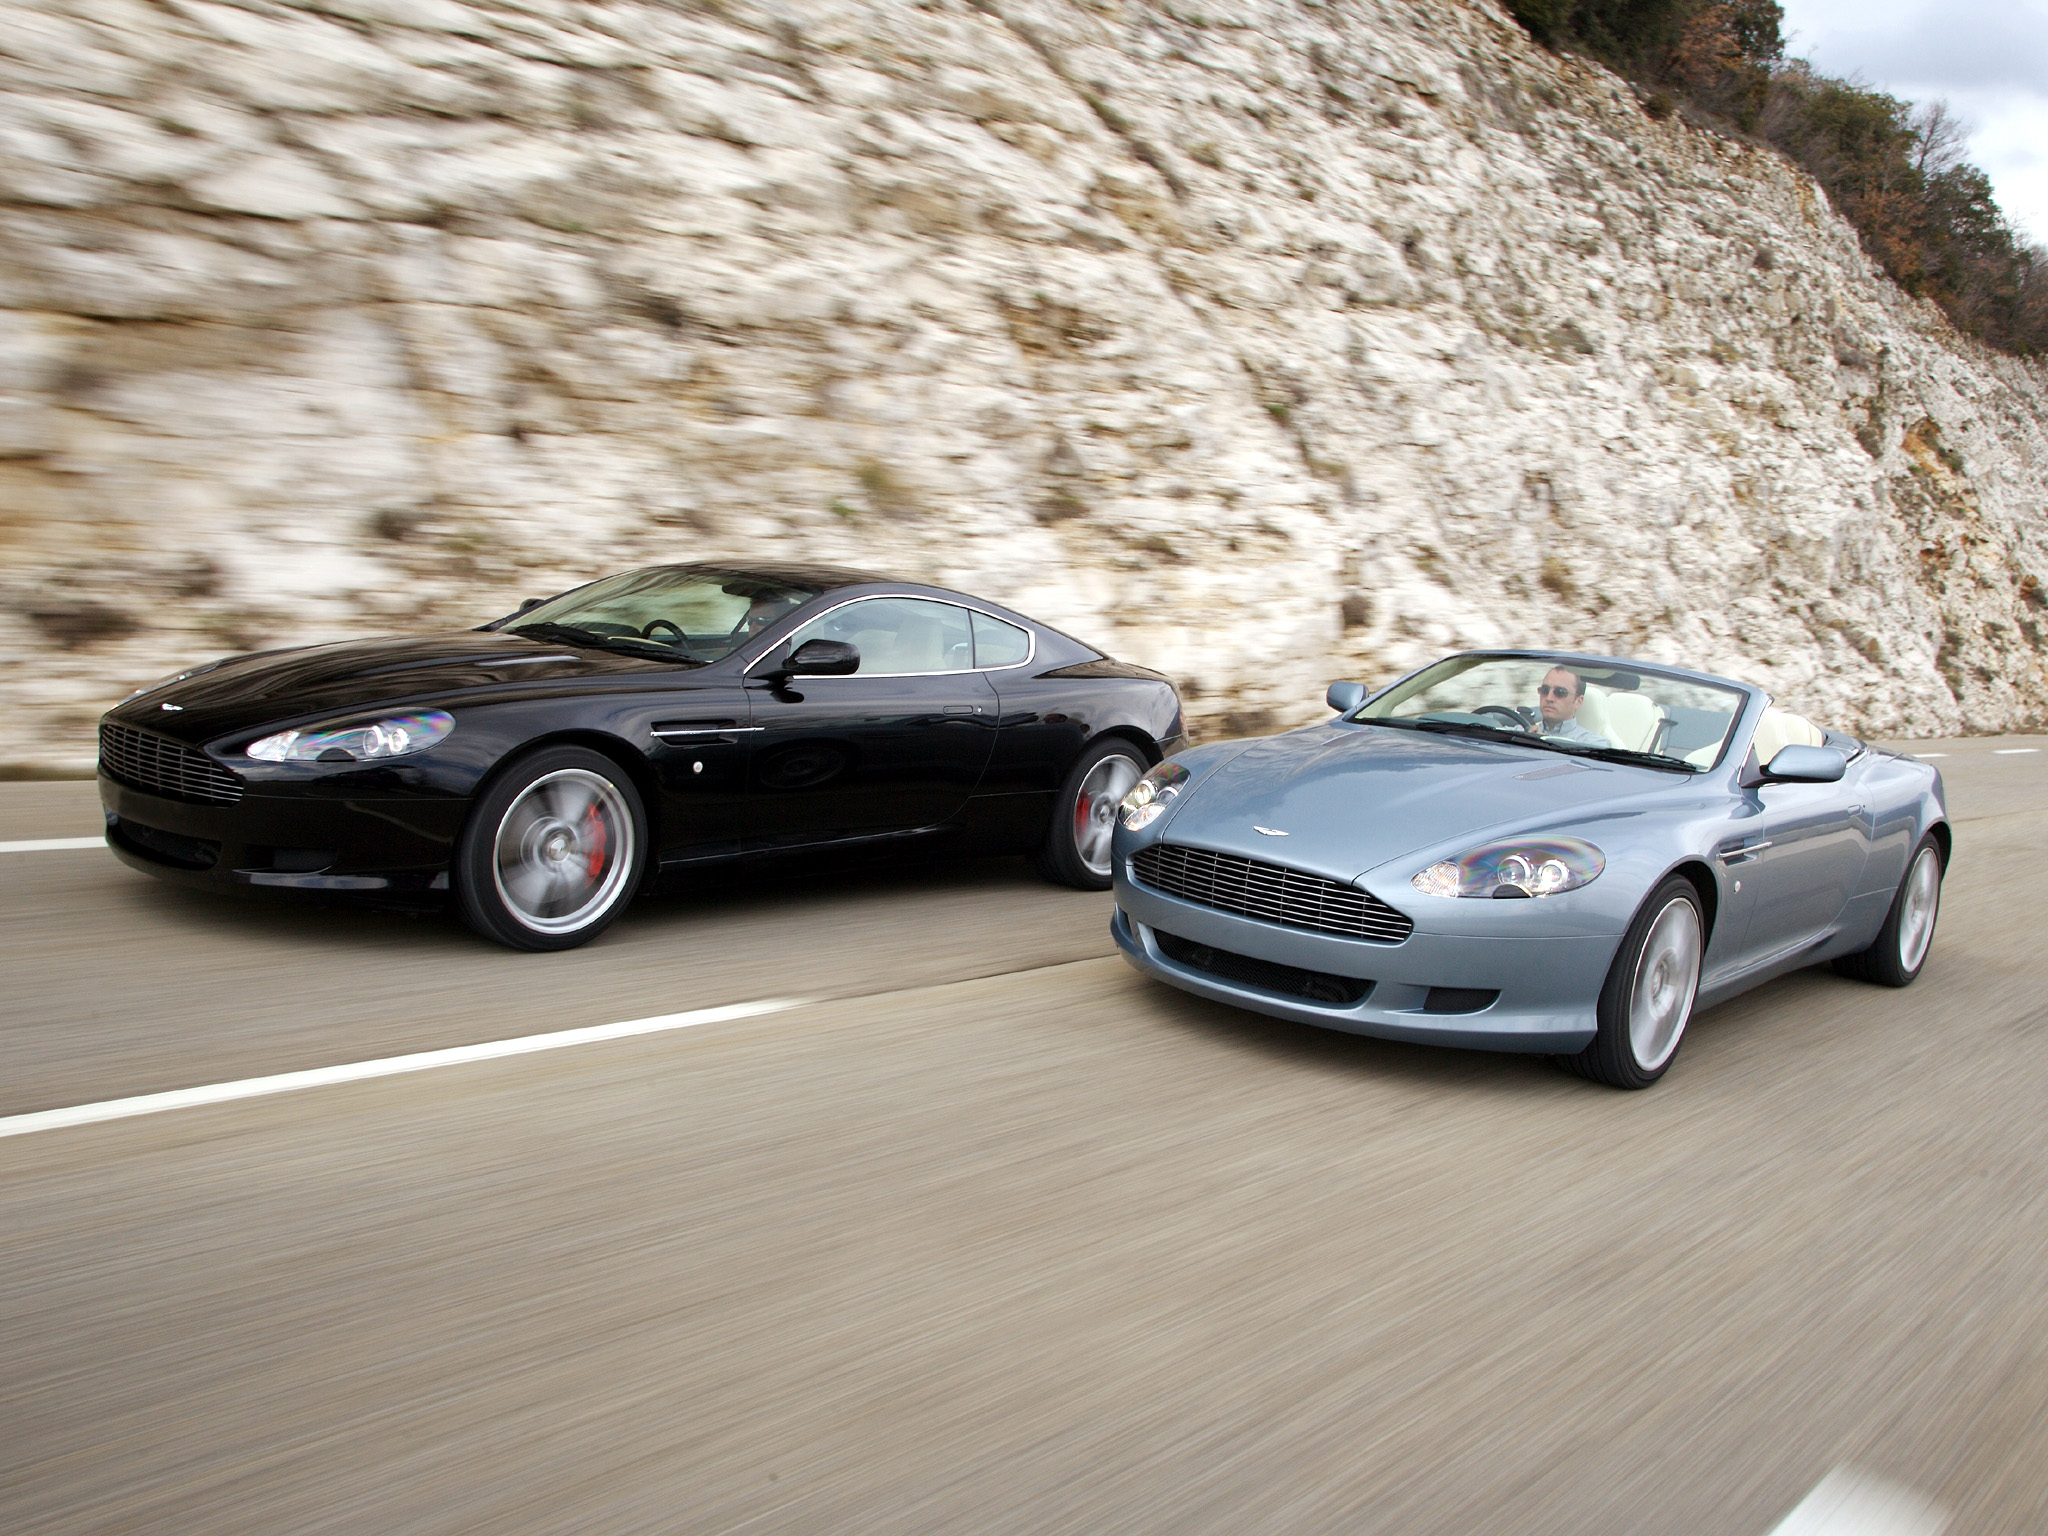 Aston Martin DB9 wallpaper 2048x1536